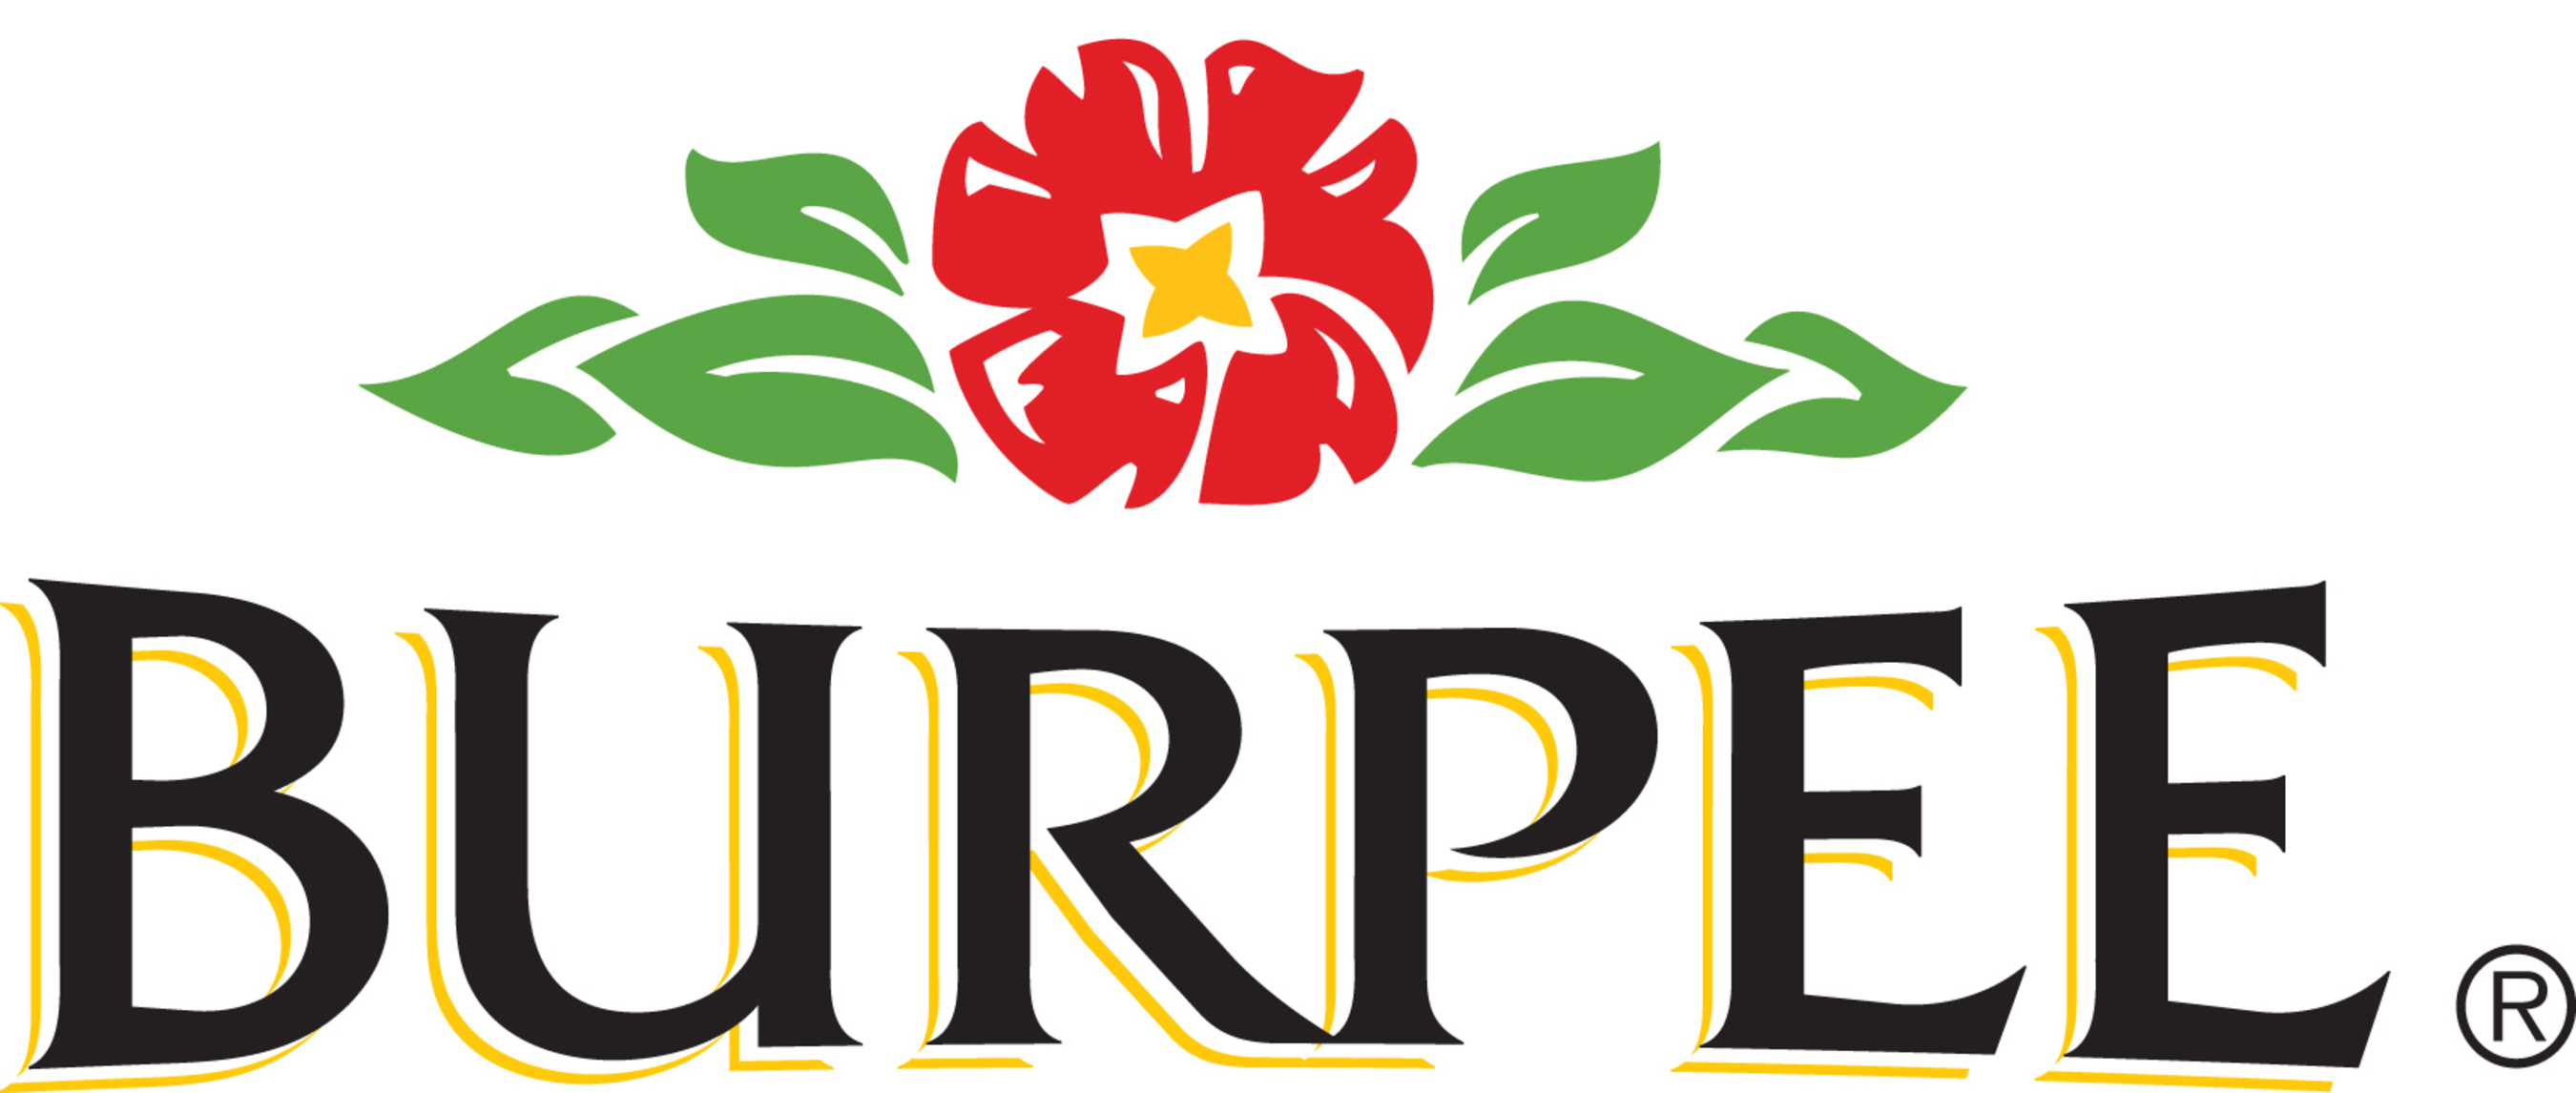 Burpee'den Tohum Siparişi